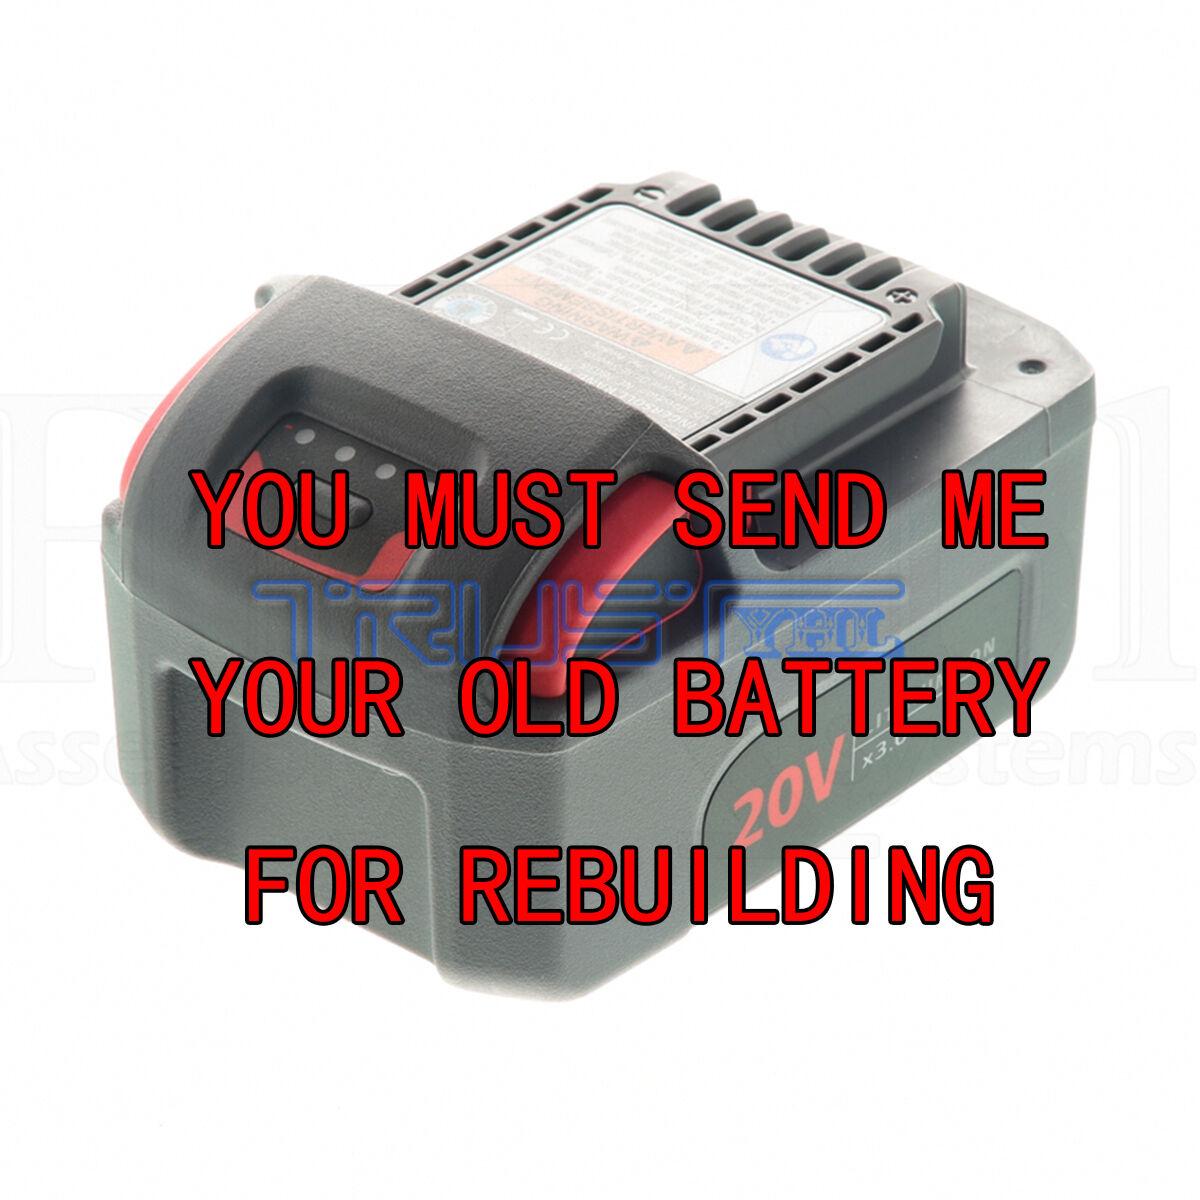 Rebuild service for Ingersoll Rand 20 Volt BL2010 Rebuilt to 2.0 A H Li-Ion